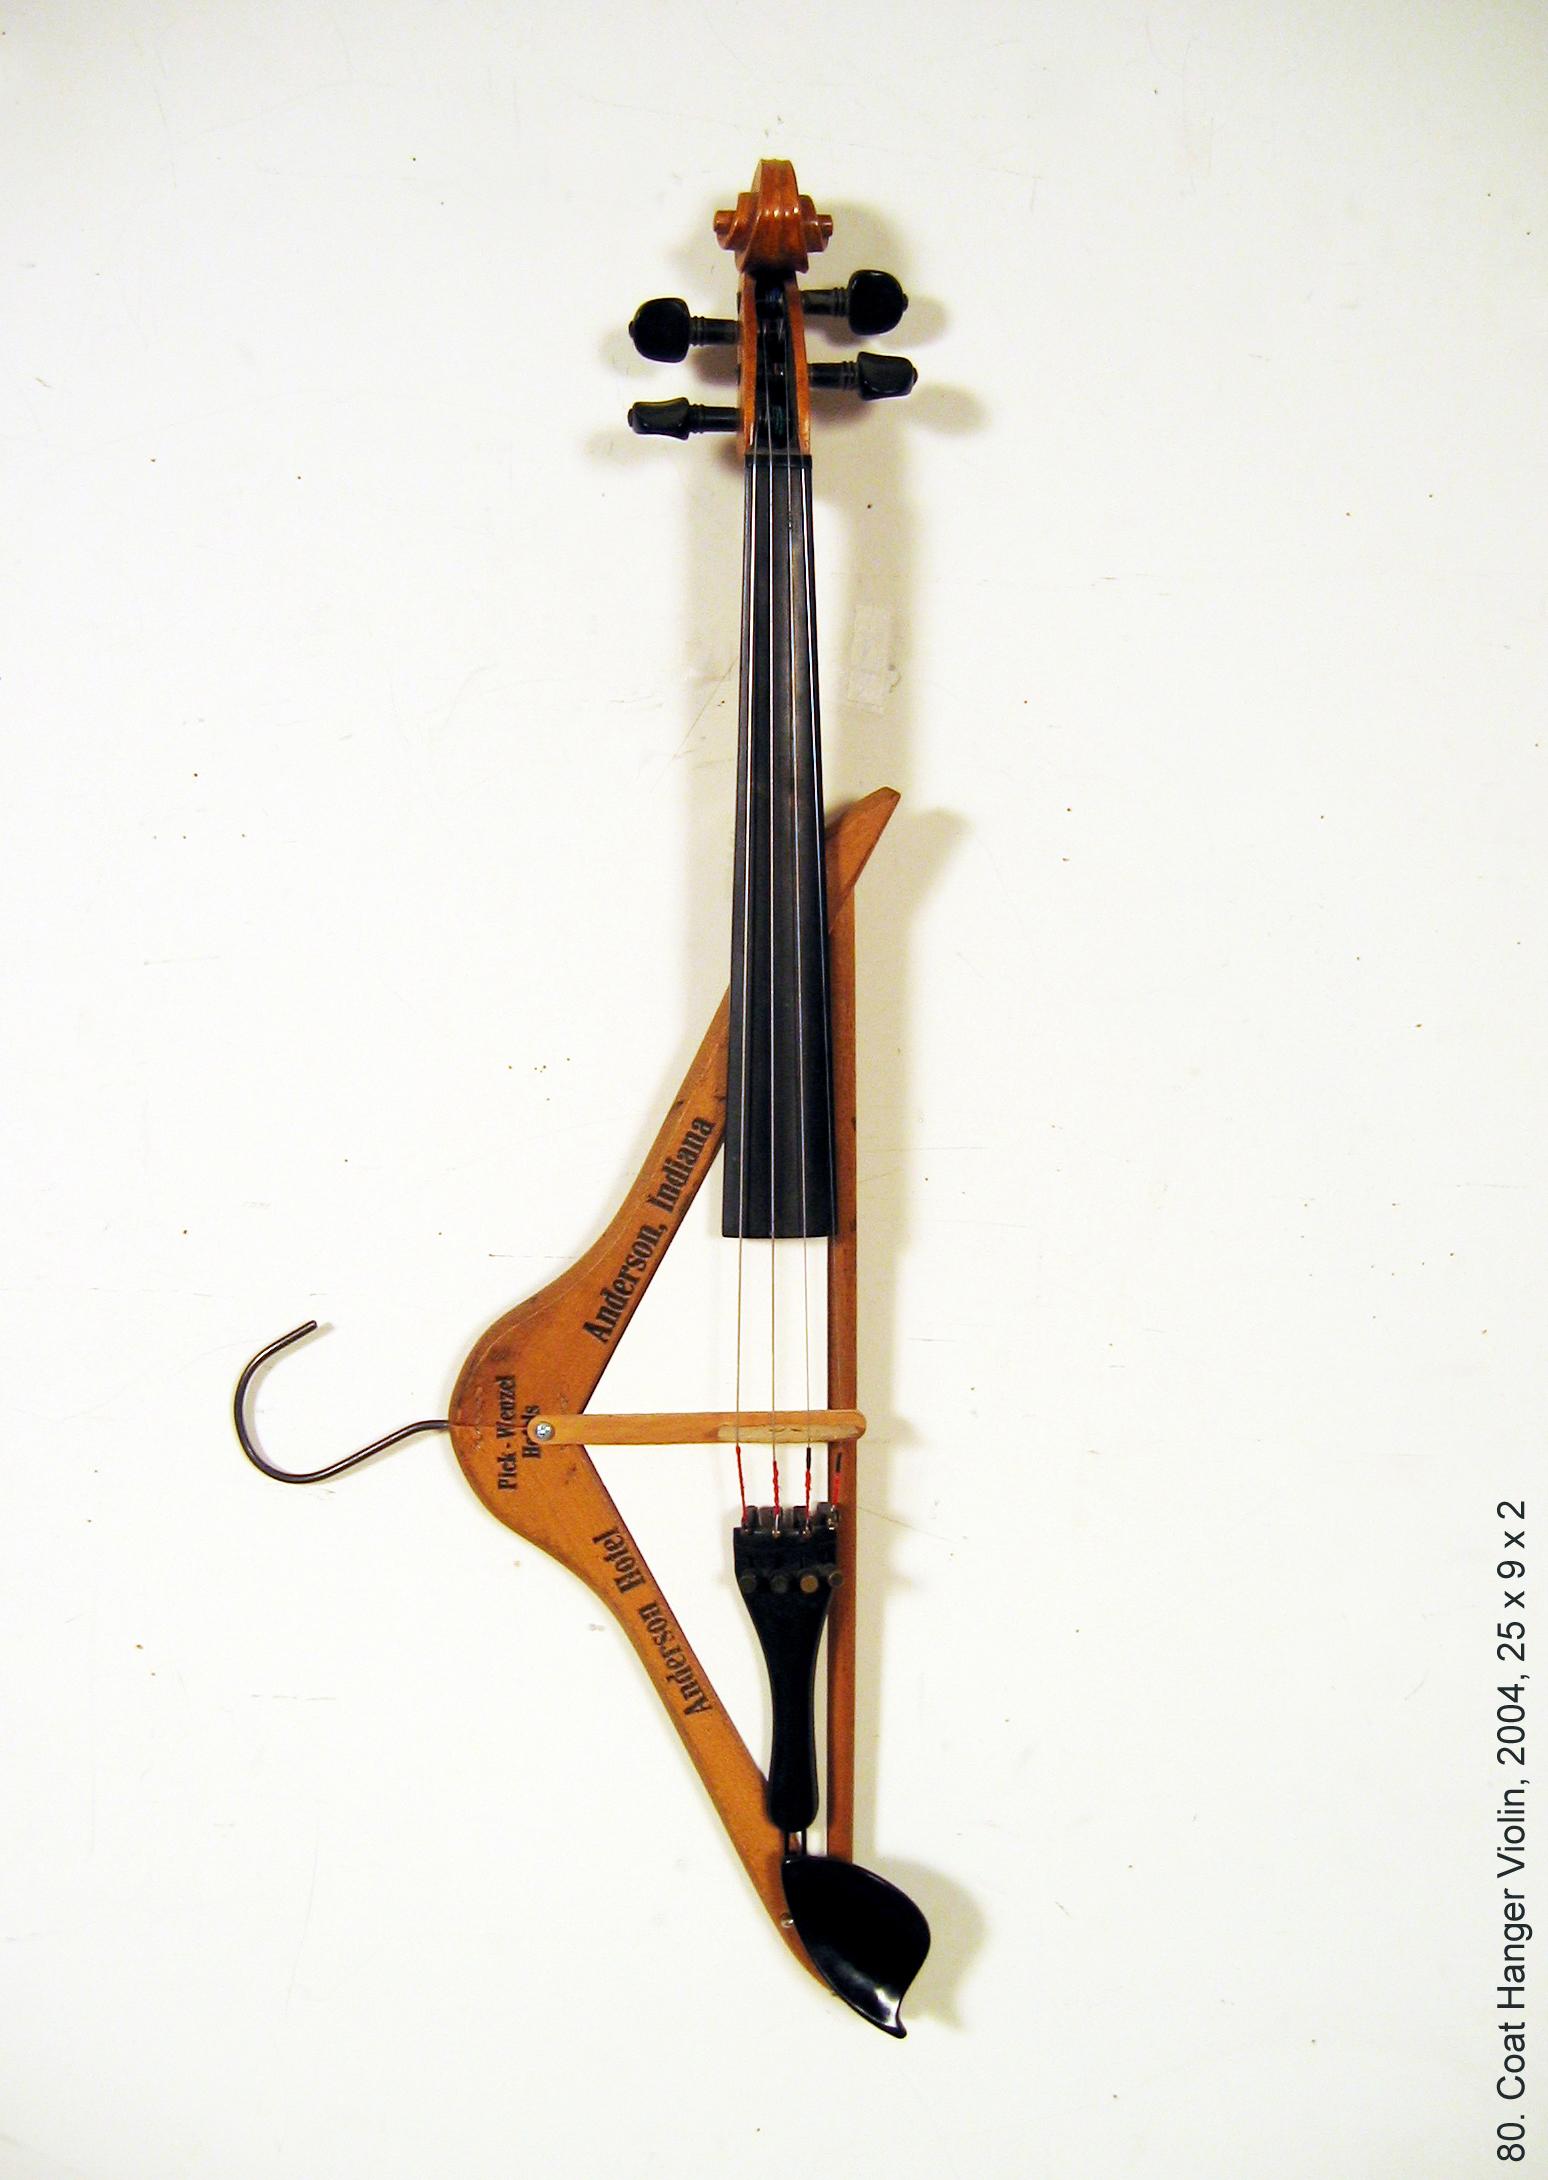 80 Coat Hanger Violin wt.jpg